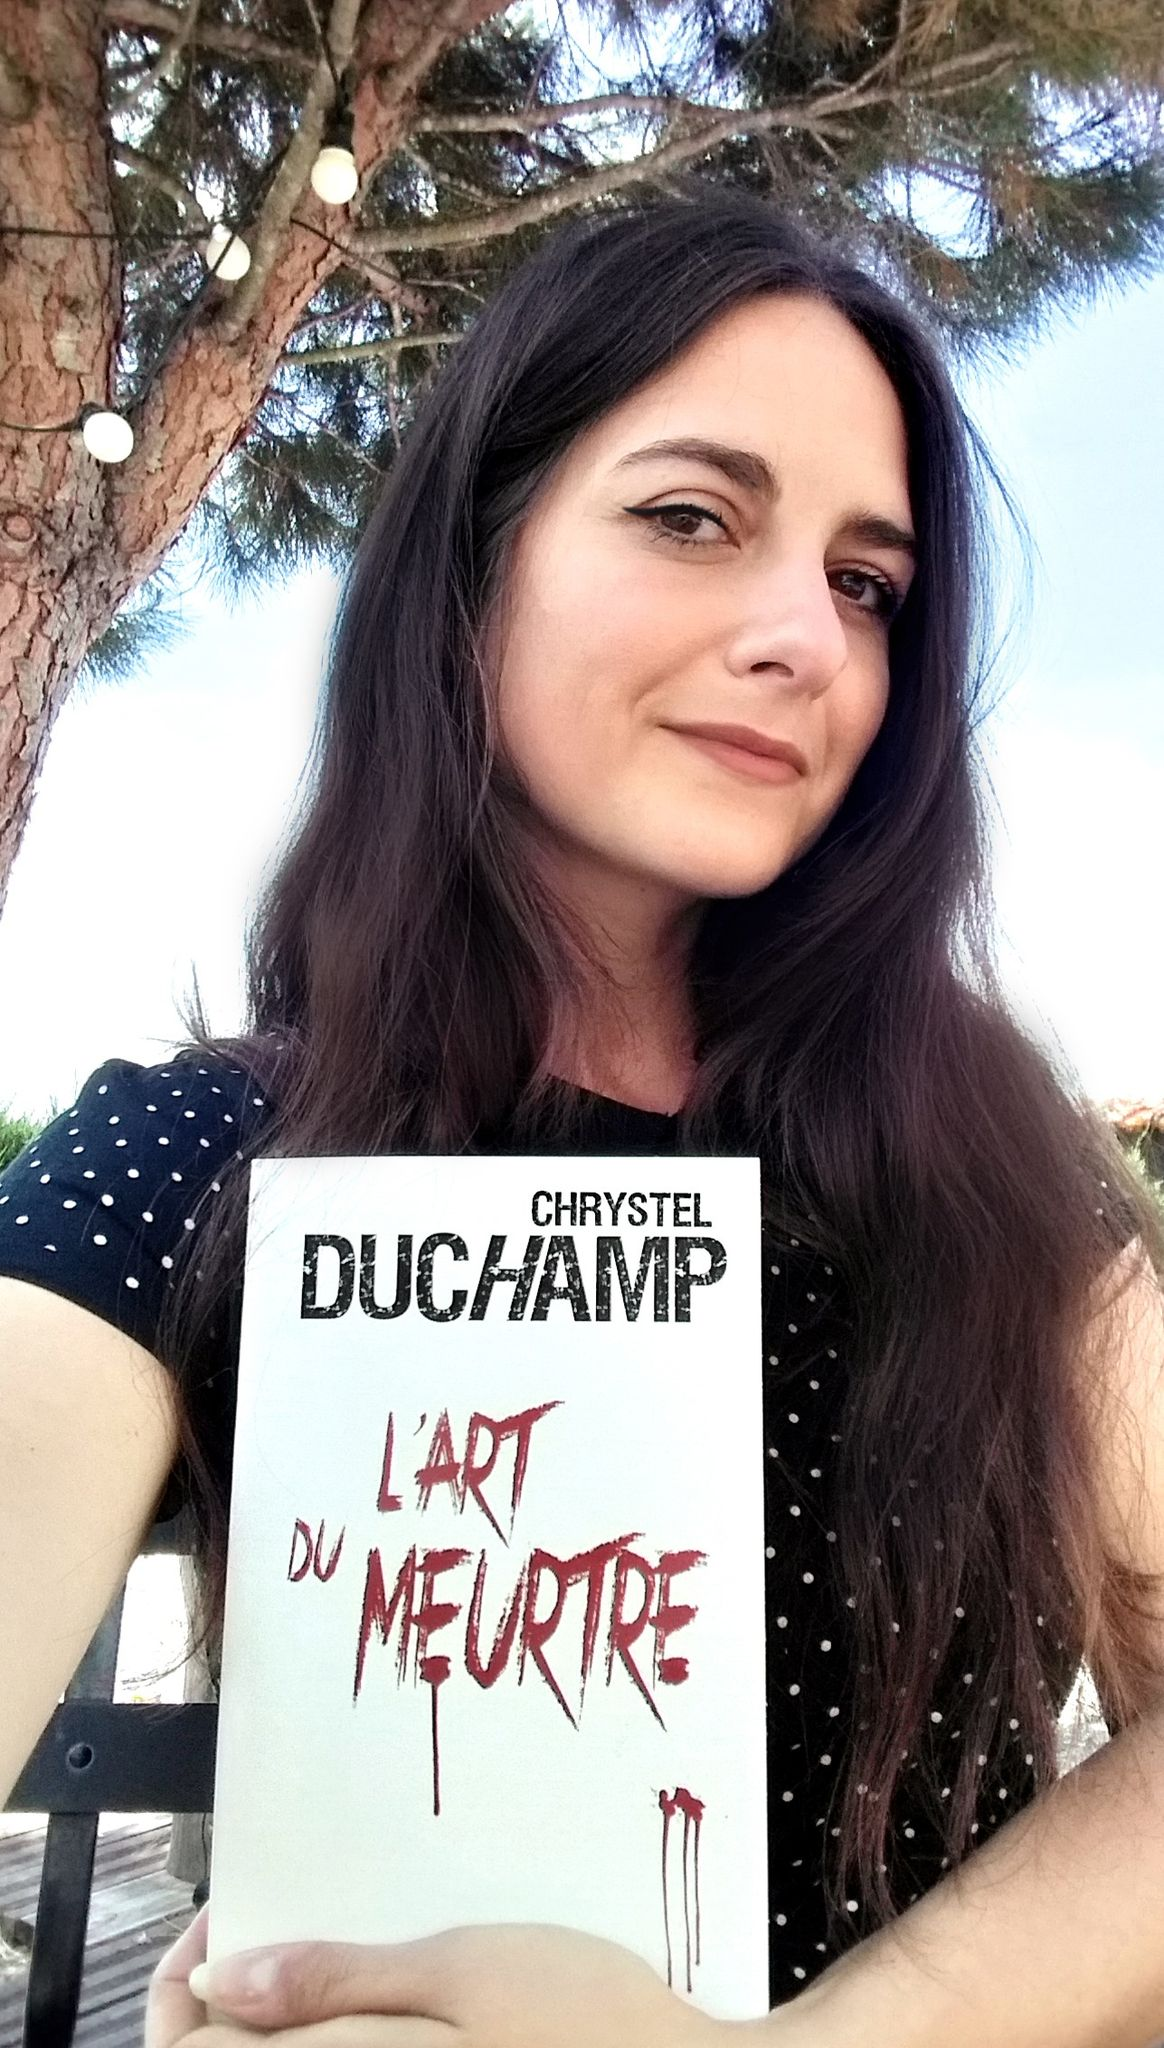 Chrystel Duchamp